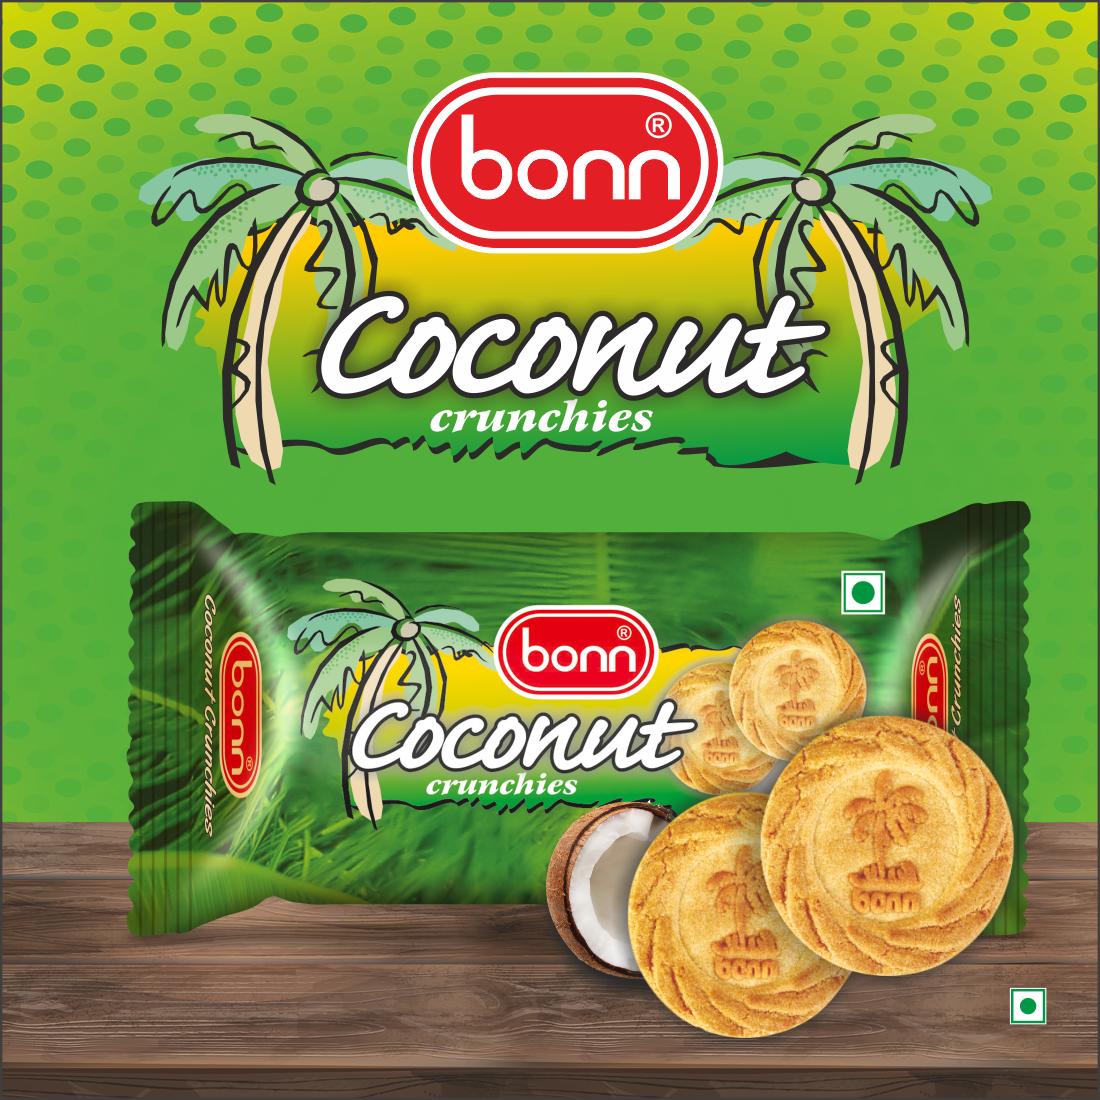 Bonn Coconut Crunch Biscuits, 40 g Pack